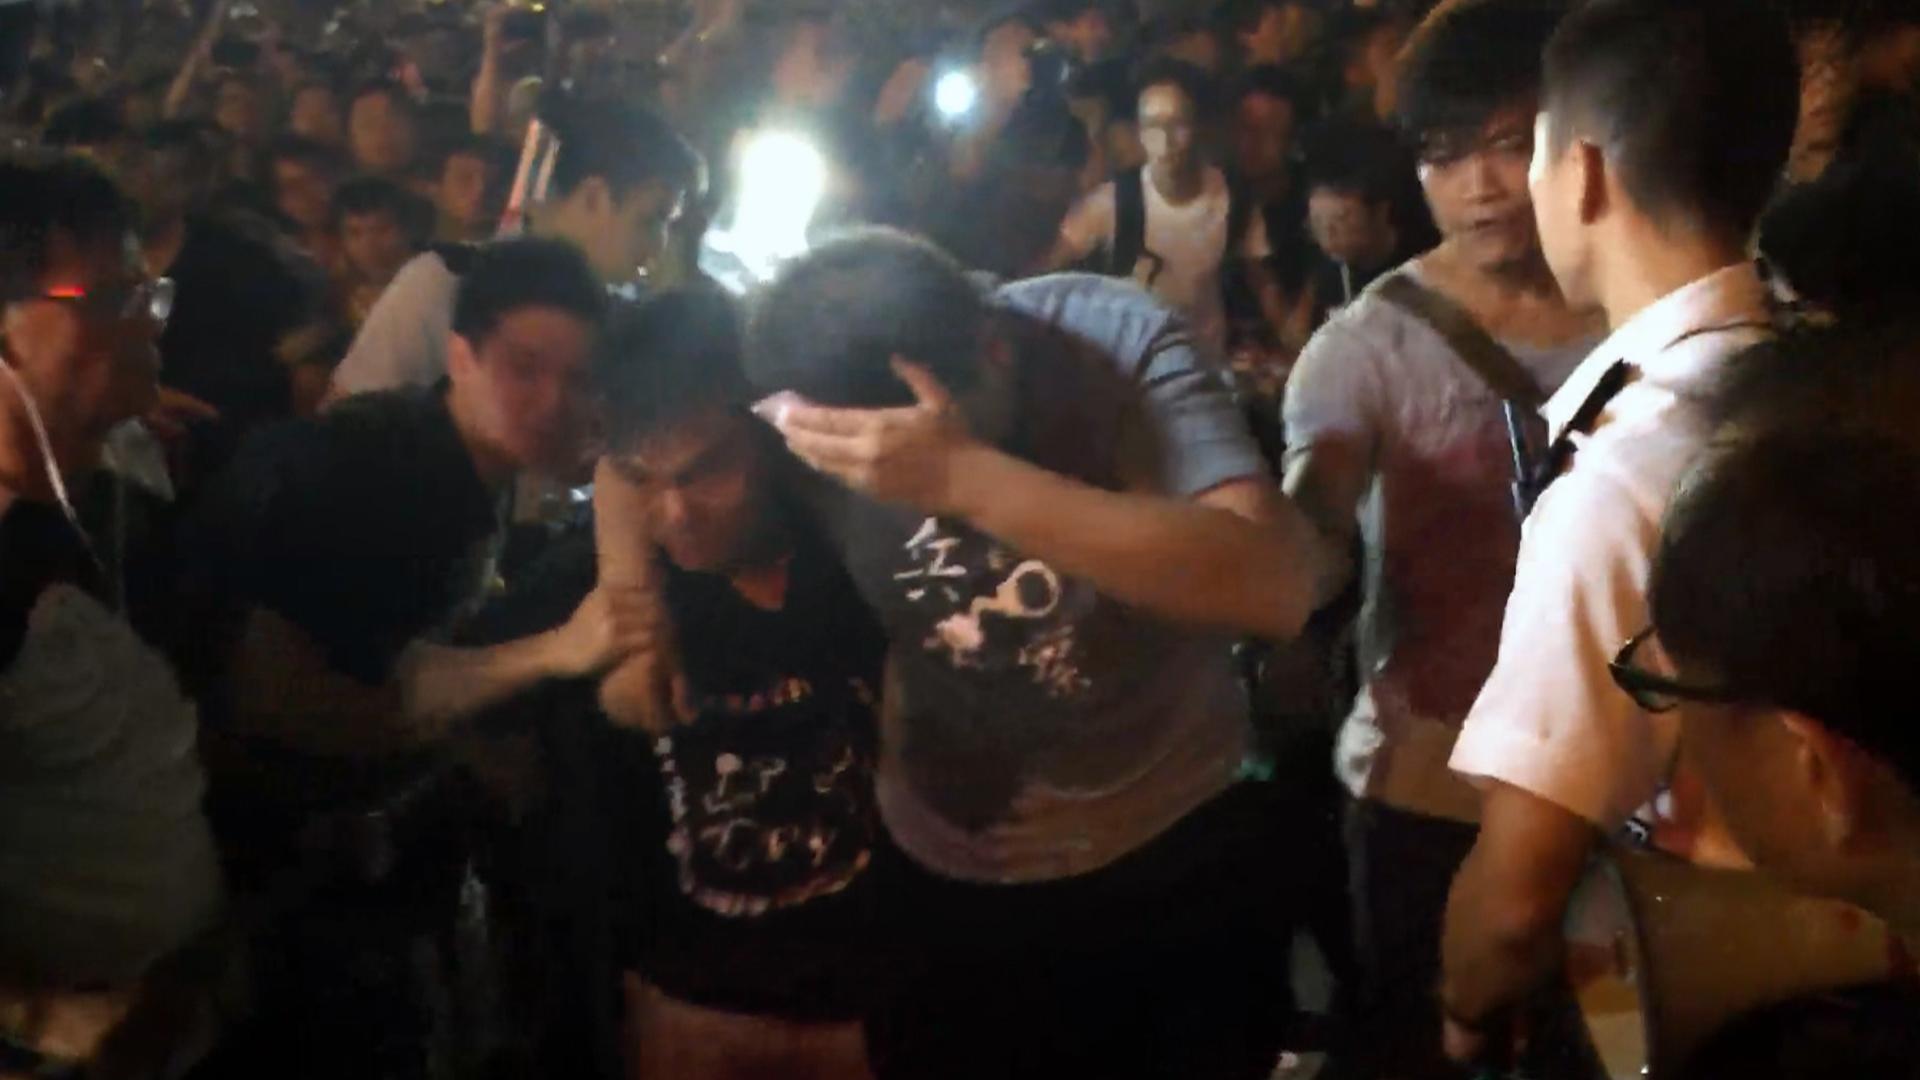 'Umbrella Revolution' Protesters Call Off Talks with Hong Kong